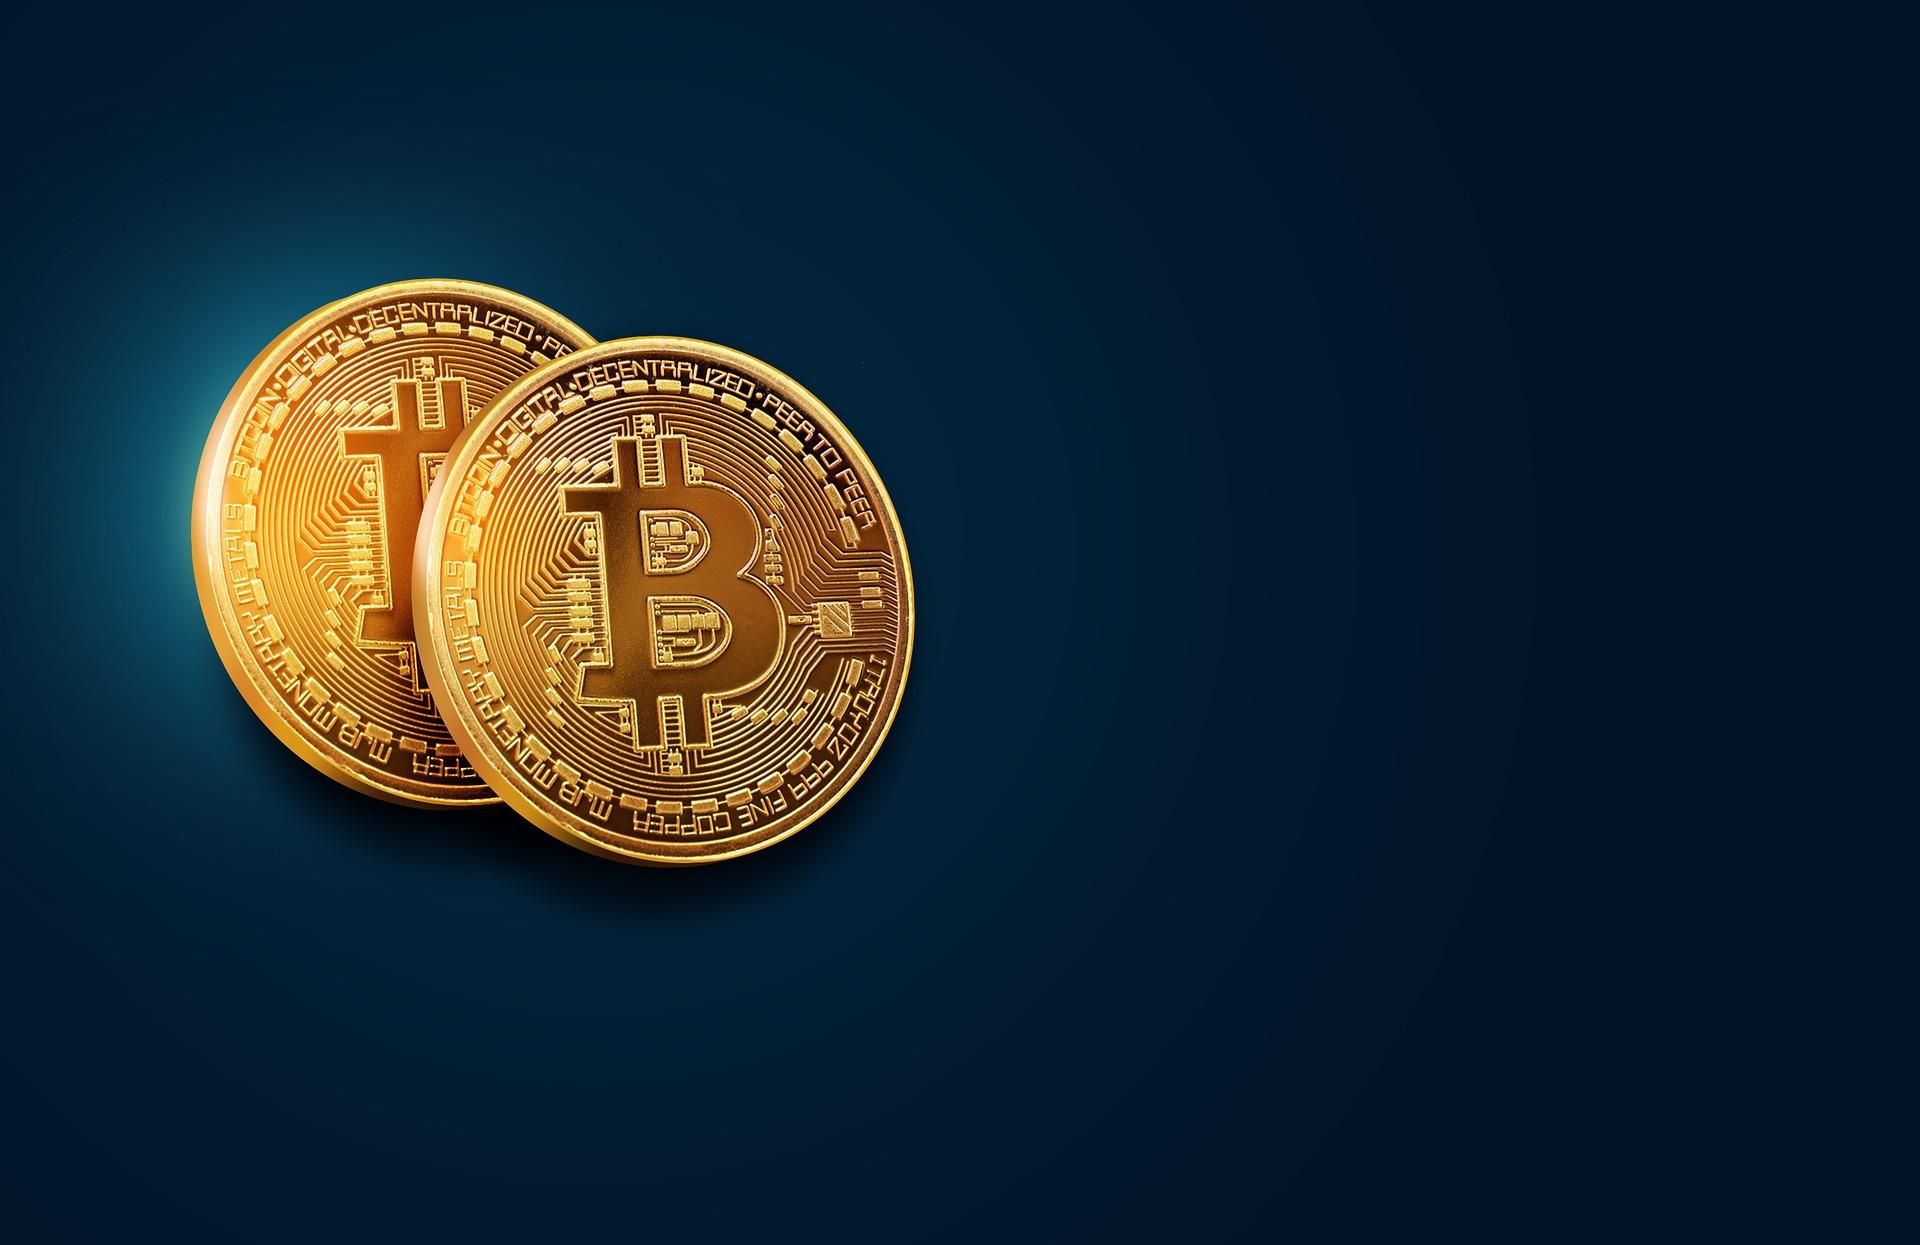 Bitcoin's Fight with JP Morgan over Market Cap